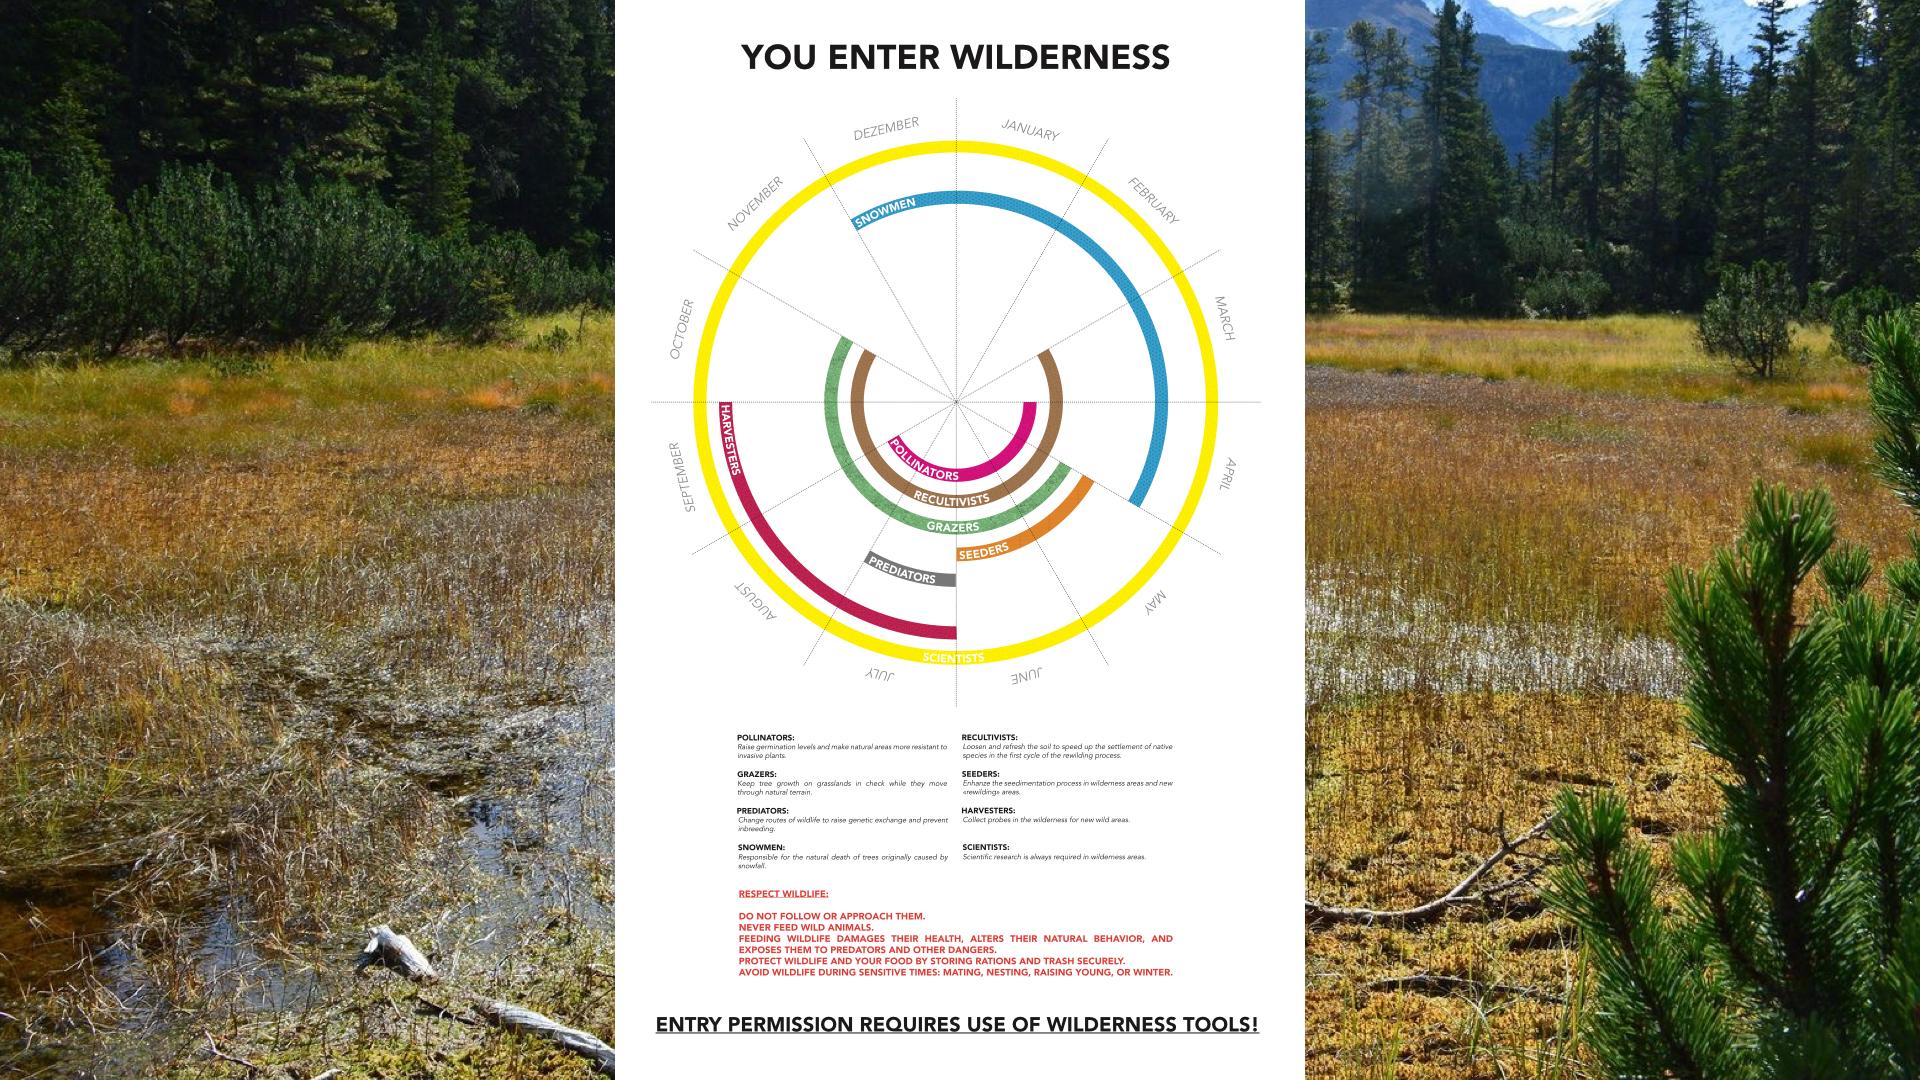 WILDERNESS-Maxlackner.014.jpeg